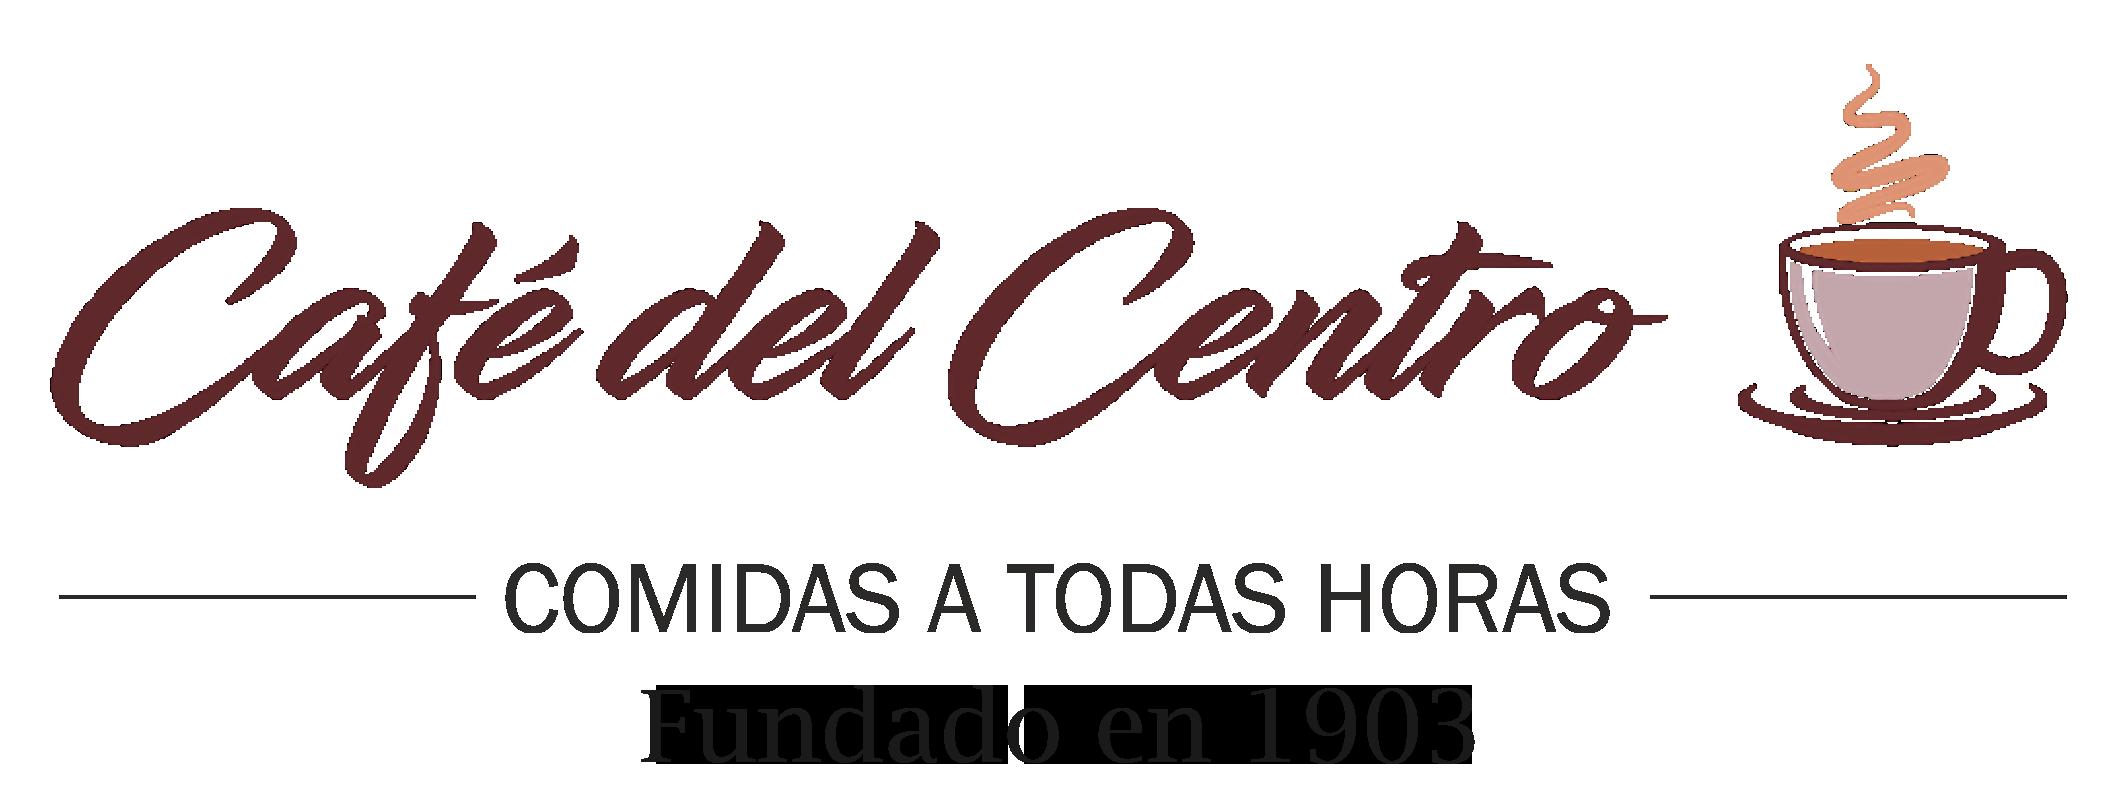 Café del Centro Lugo